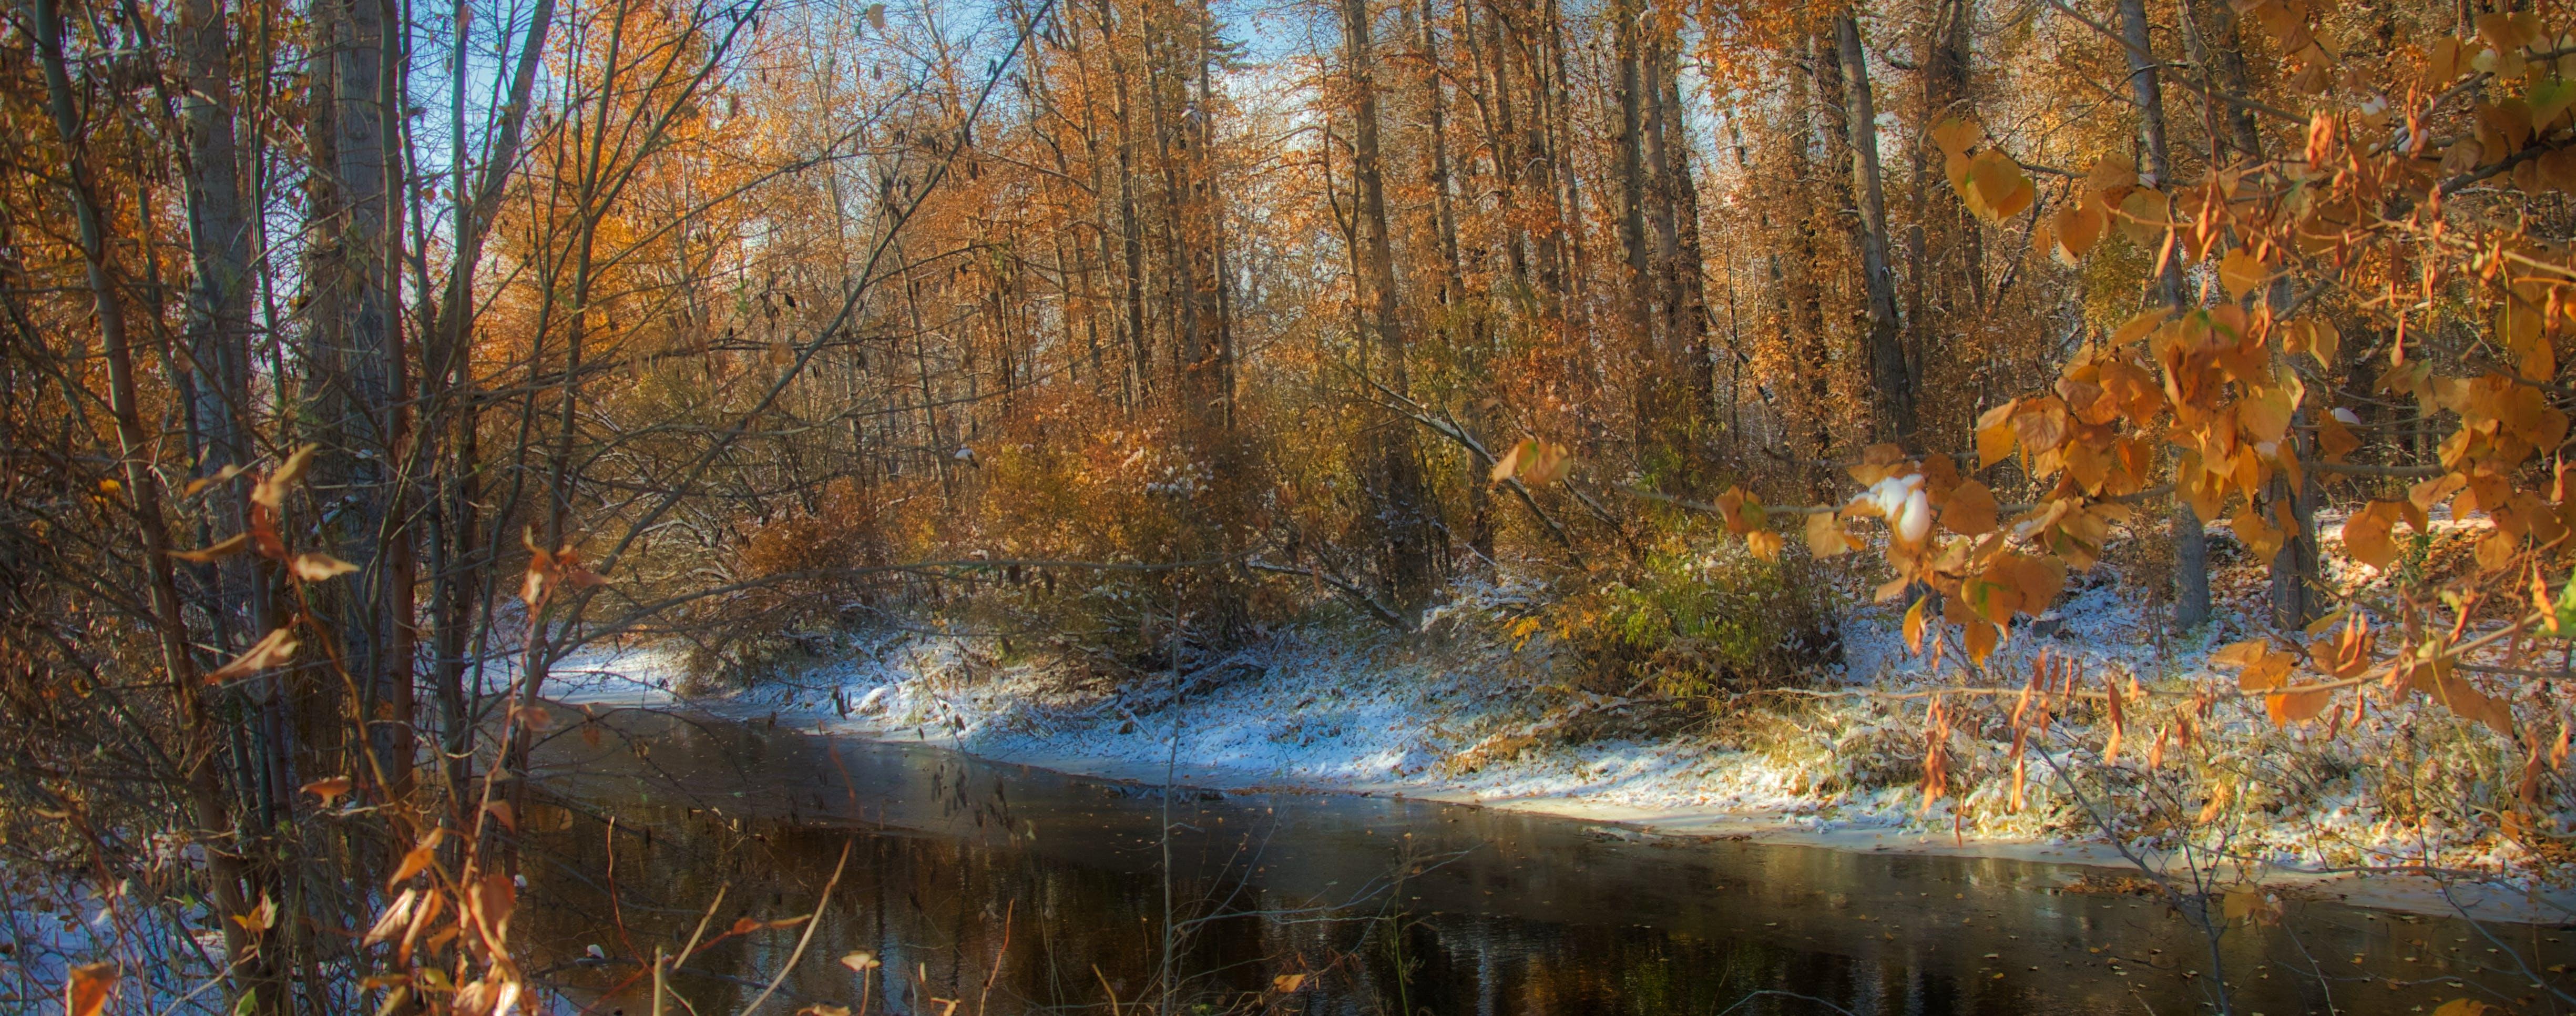 Free stock photo of snow river creek winter fall autumn colour